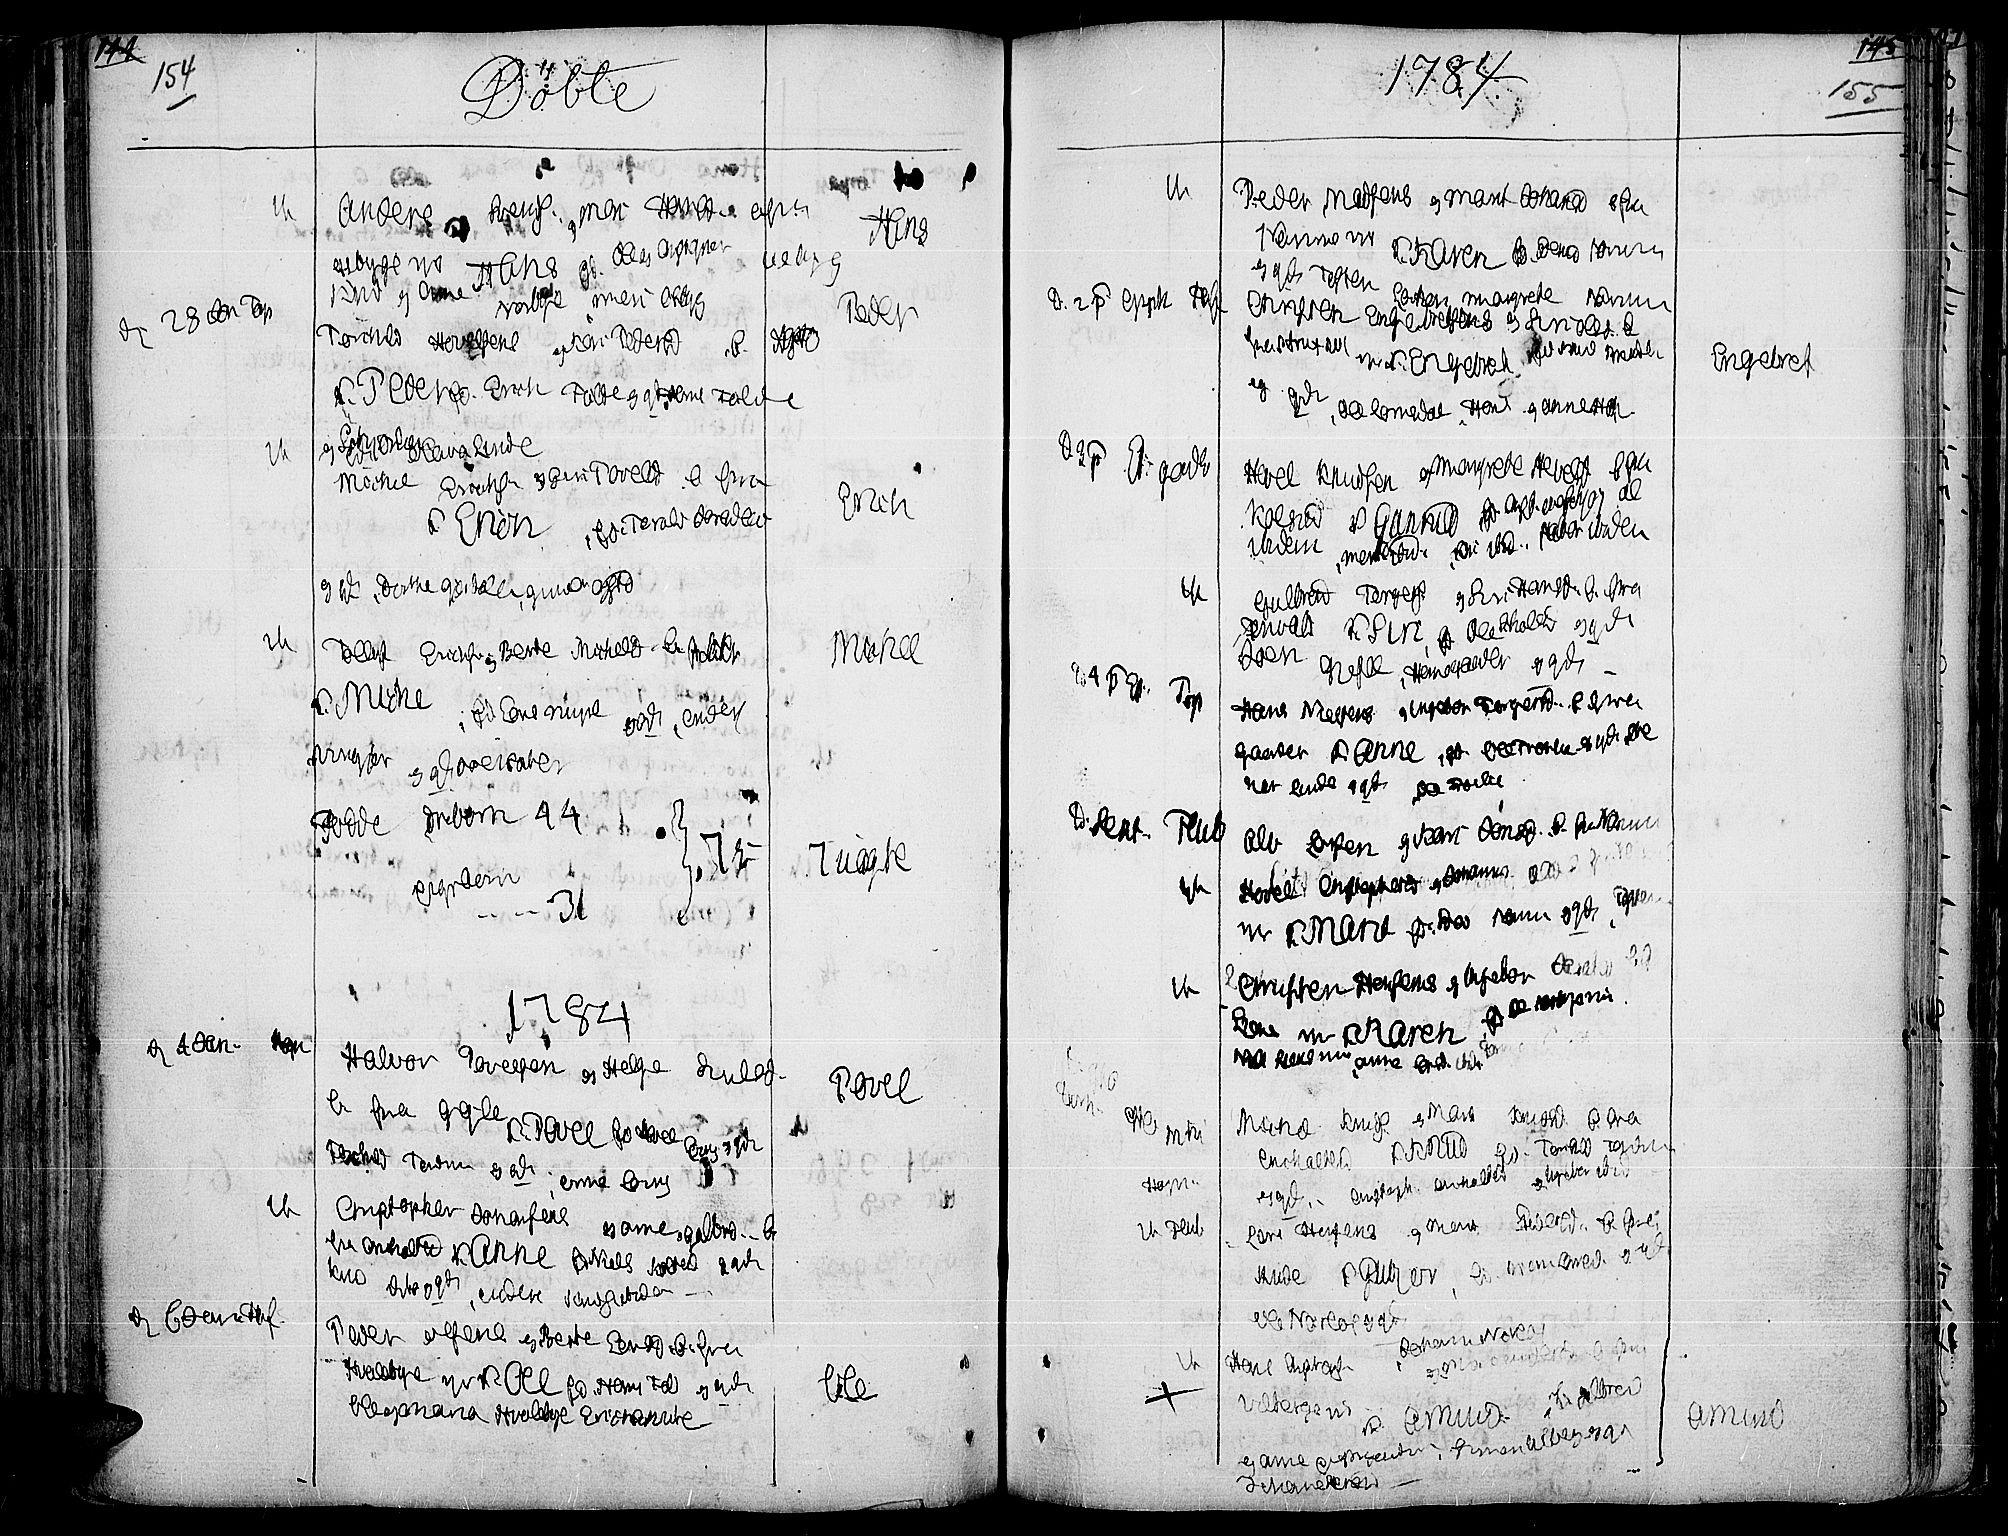 SAH, Land prestekontor, Ministerialbok nr. 5, 1765-1784, s. 154-155